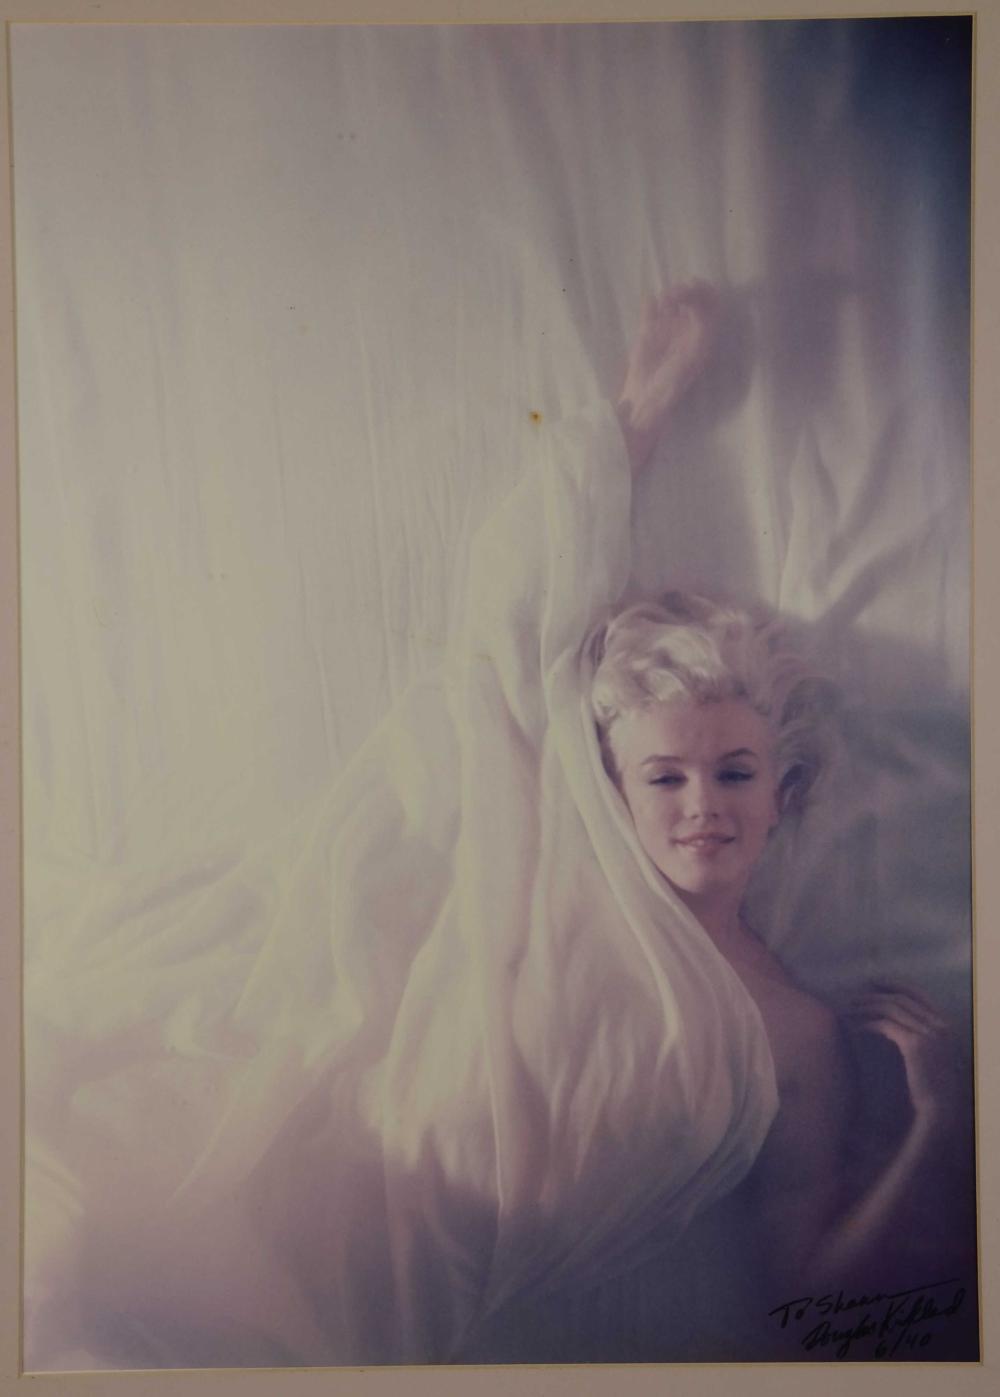 Douglas Kirkland. Marilyn Monroe. 1961.